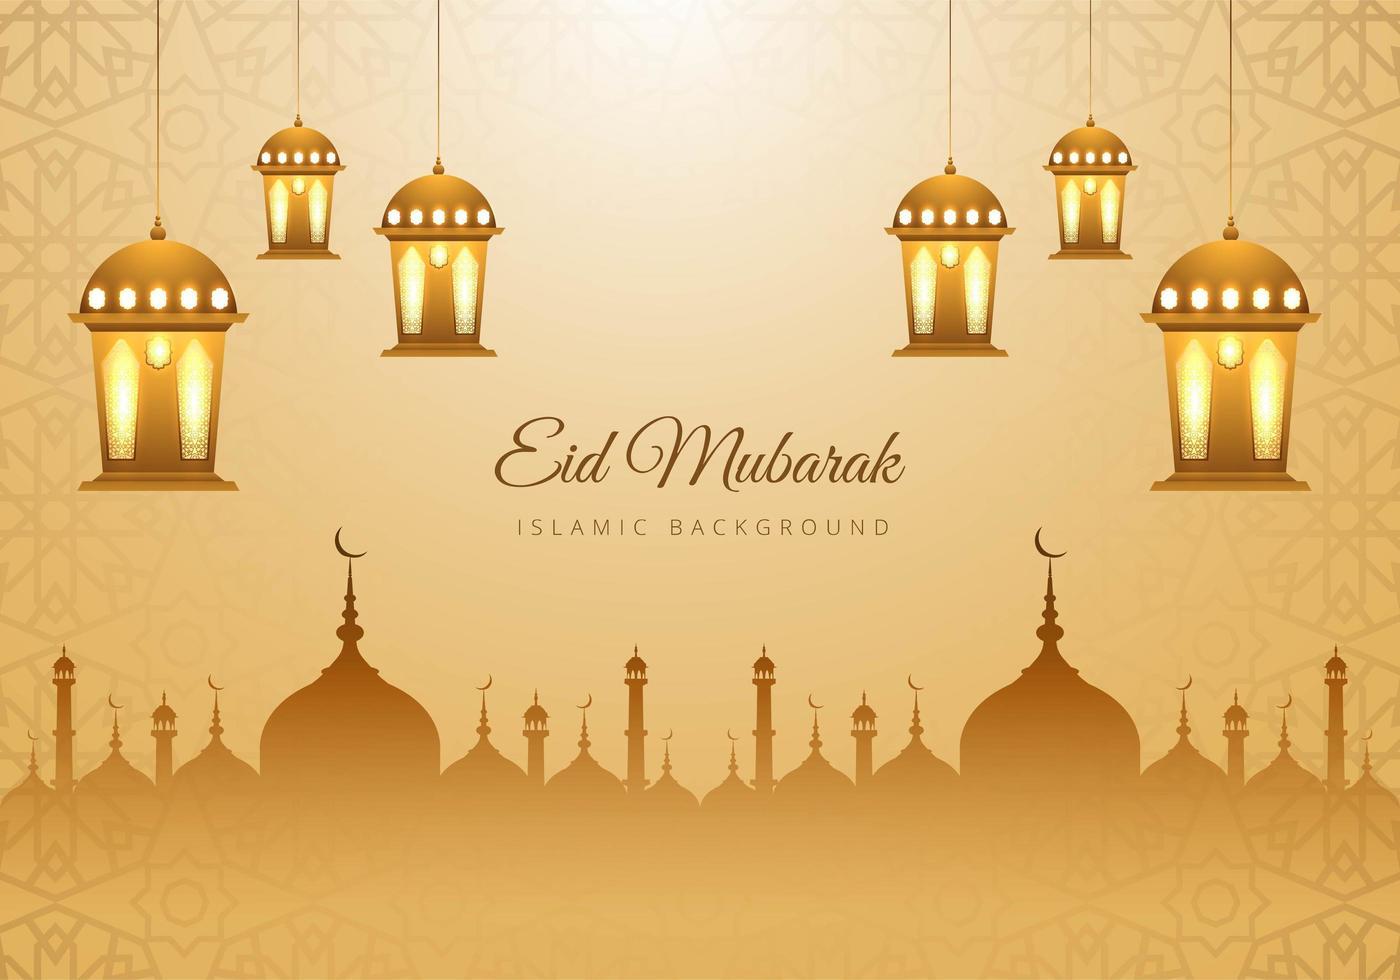 Islamic Eid Mubarak Tan Mosque Silhouette Lanterns Background 1052076 Vector Art At Vecteezy